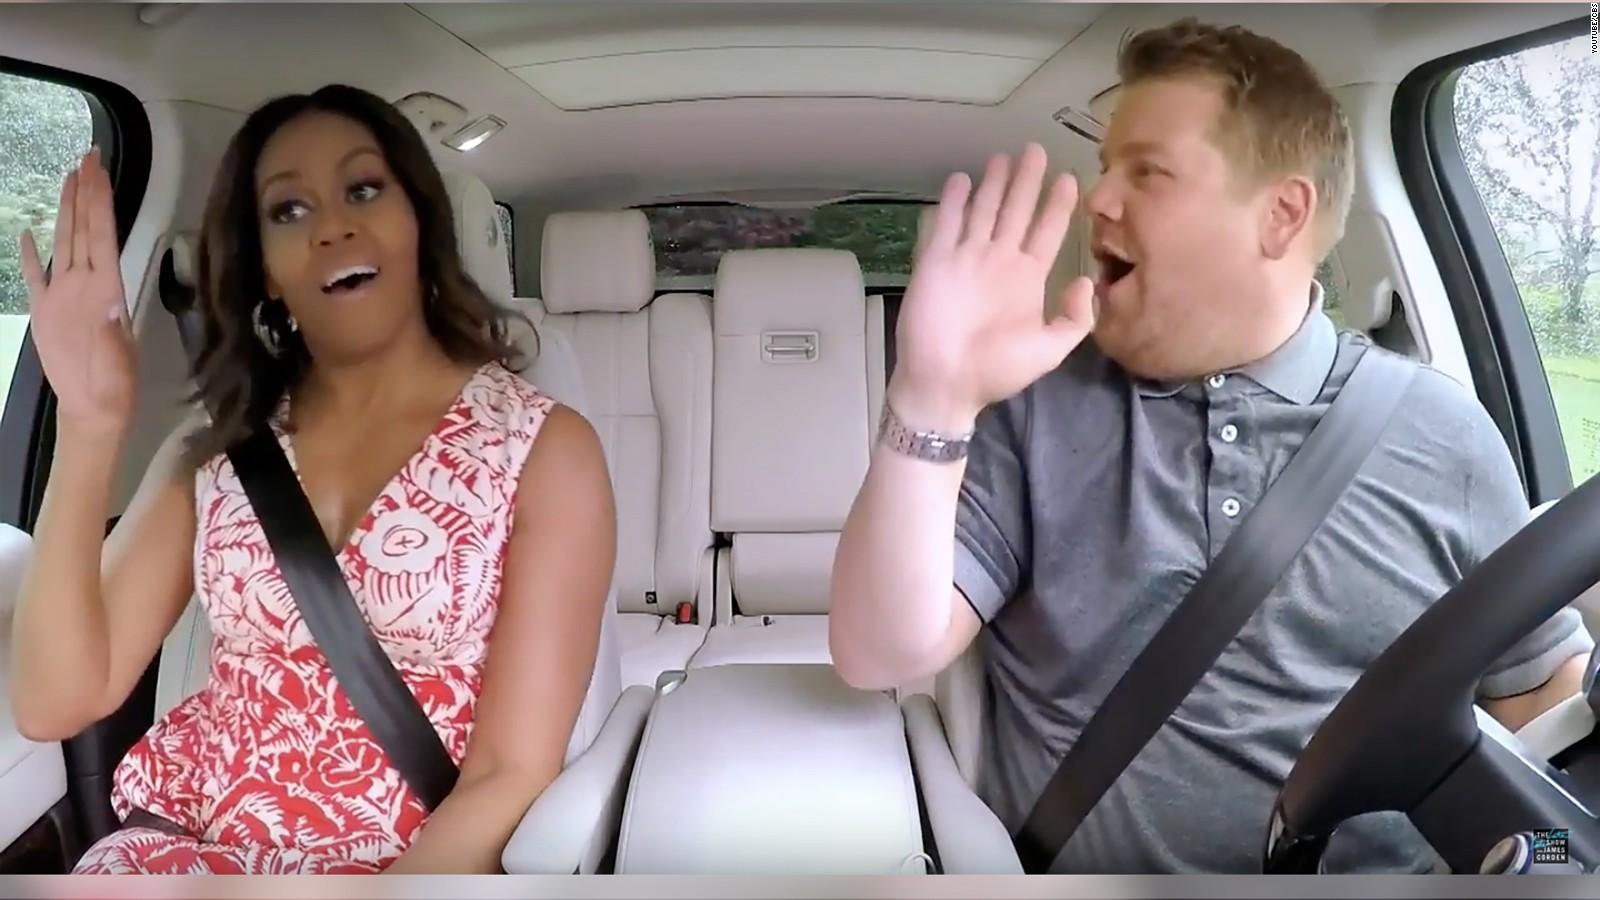 michelle obama jams to carpool karaoke gets star trek freak on